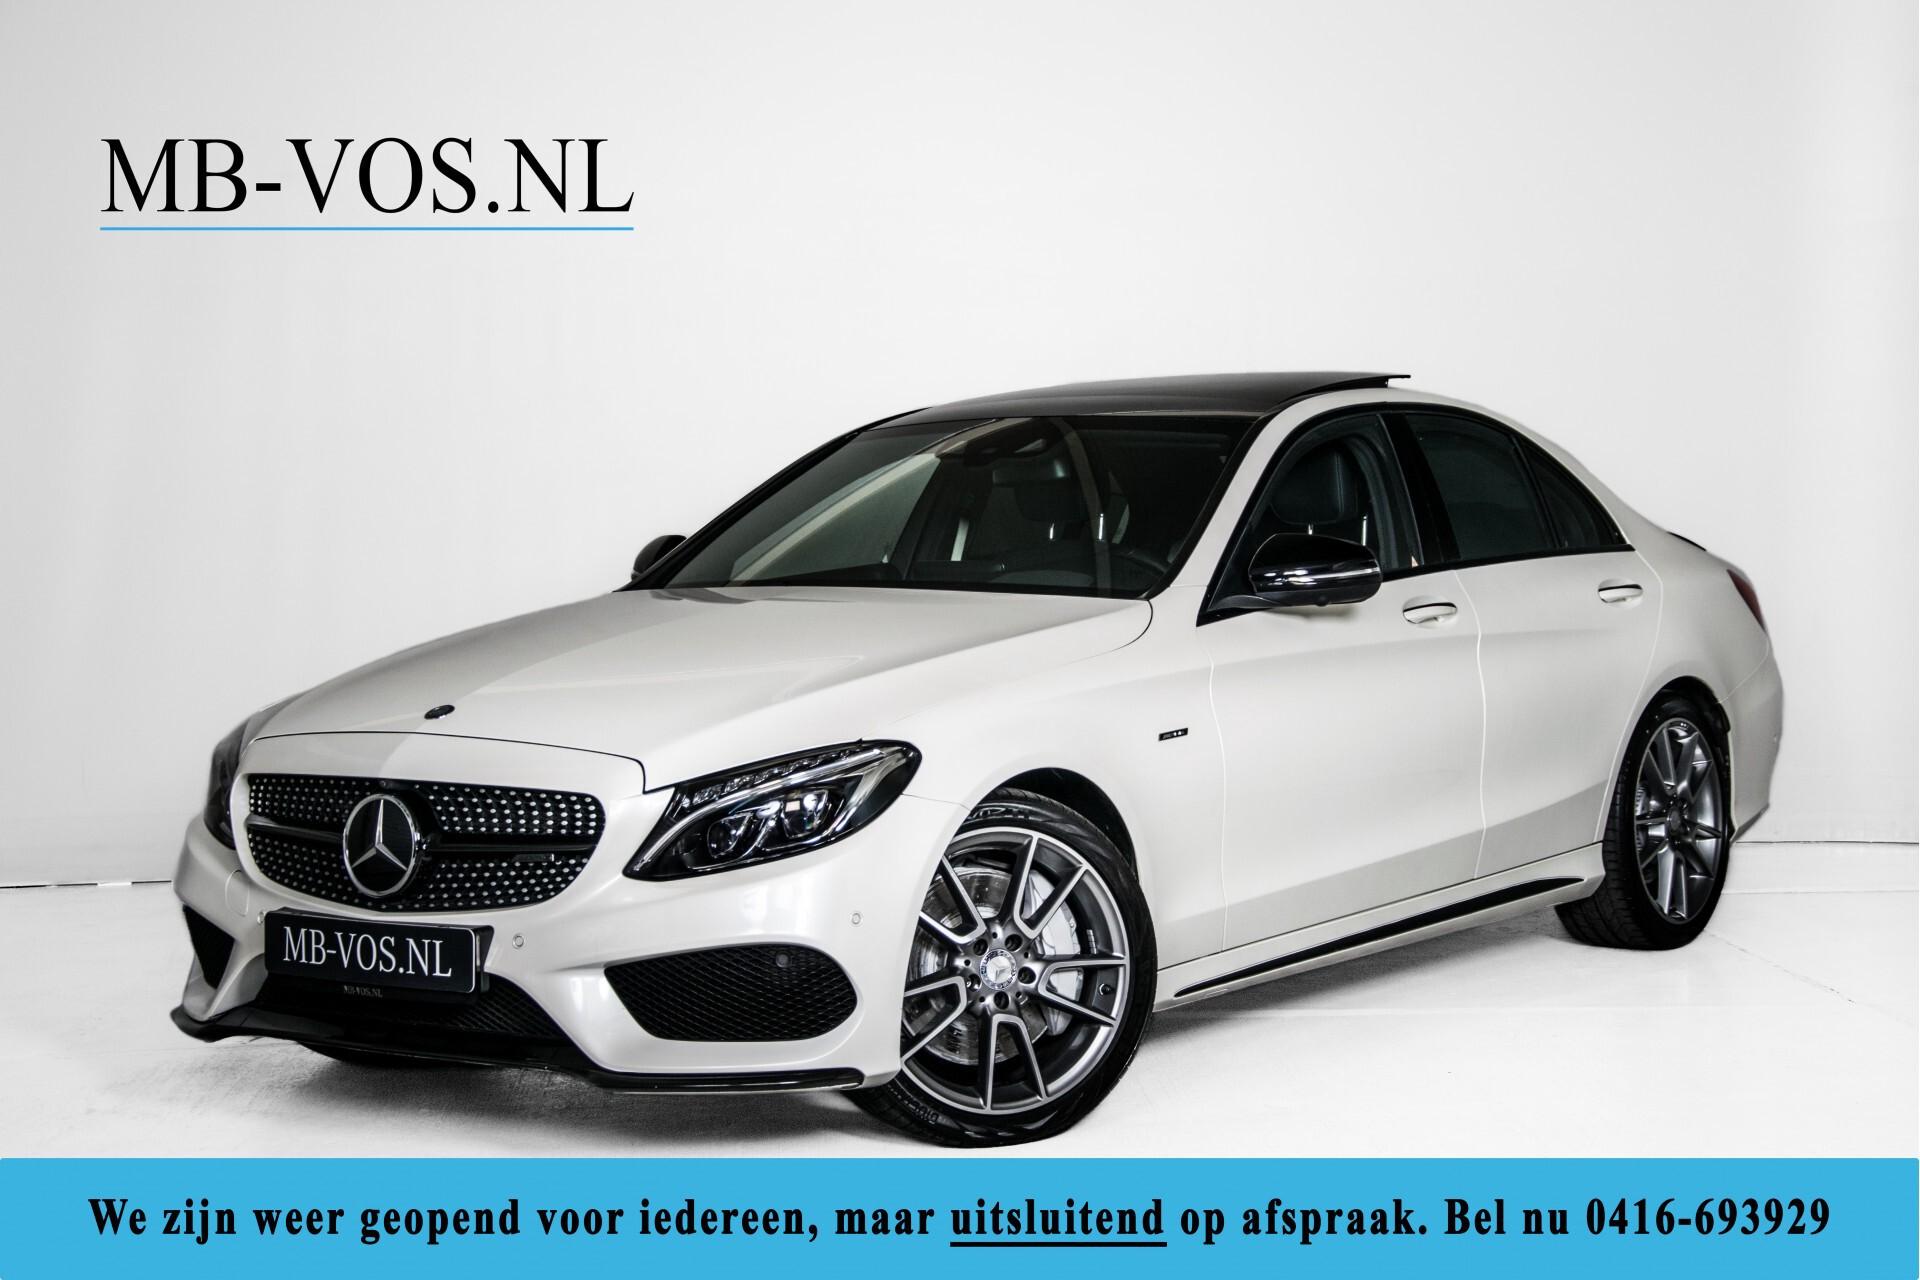 Mercedes-Benz C-Klasse 450/43 AMG 4-M Distronic/Standkachel/Panorama/Keyless/Harman-Kardon/Stoelkoeling Aut7 Foto 1